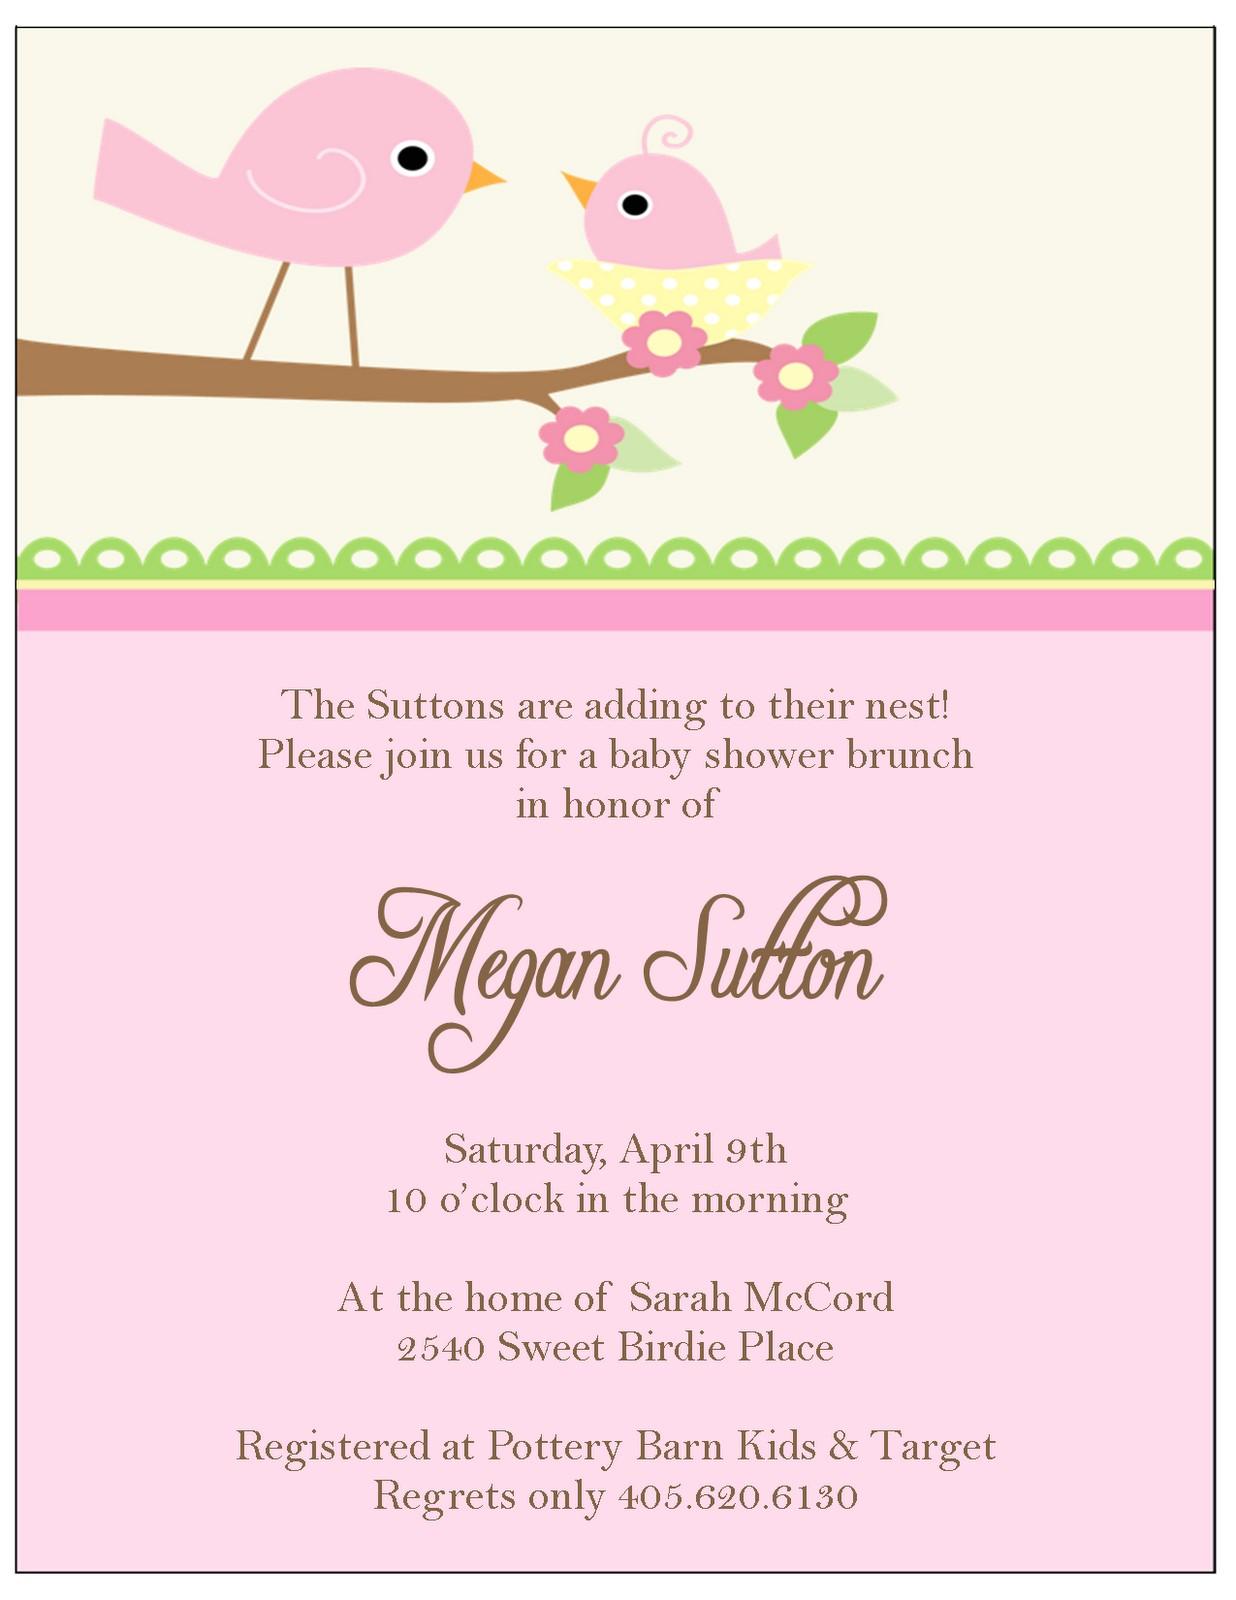 little bir baby shower invitations